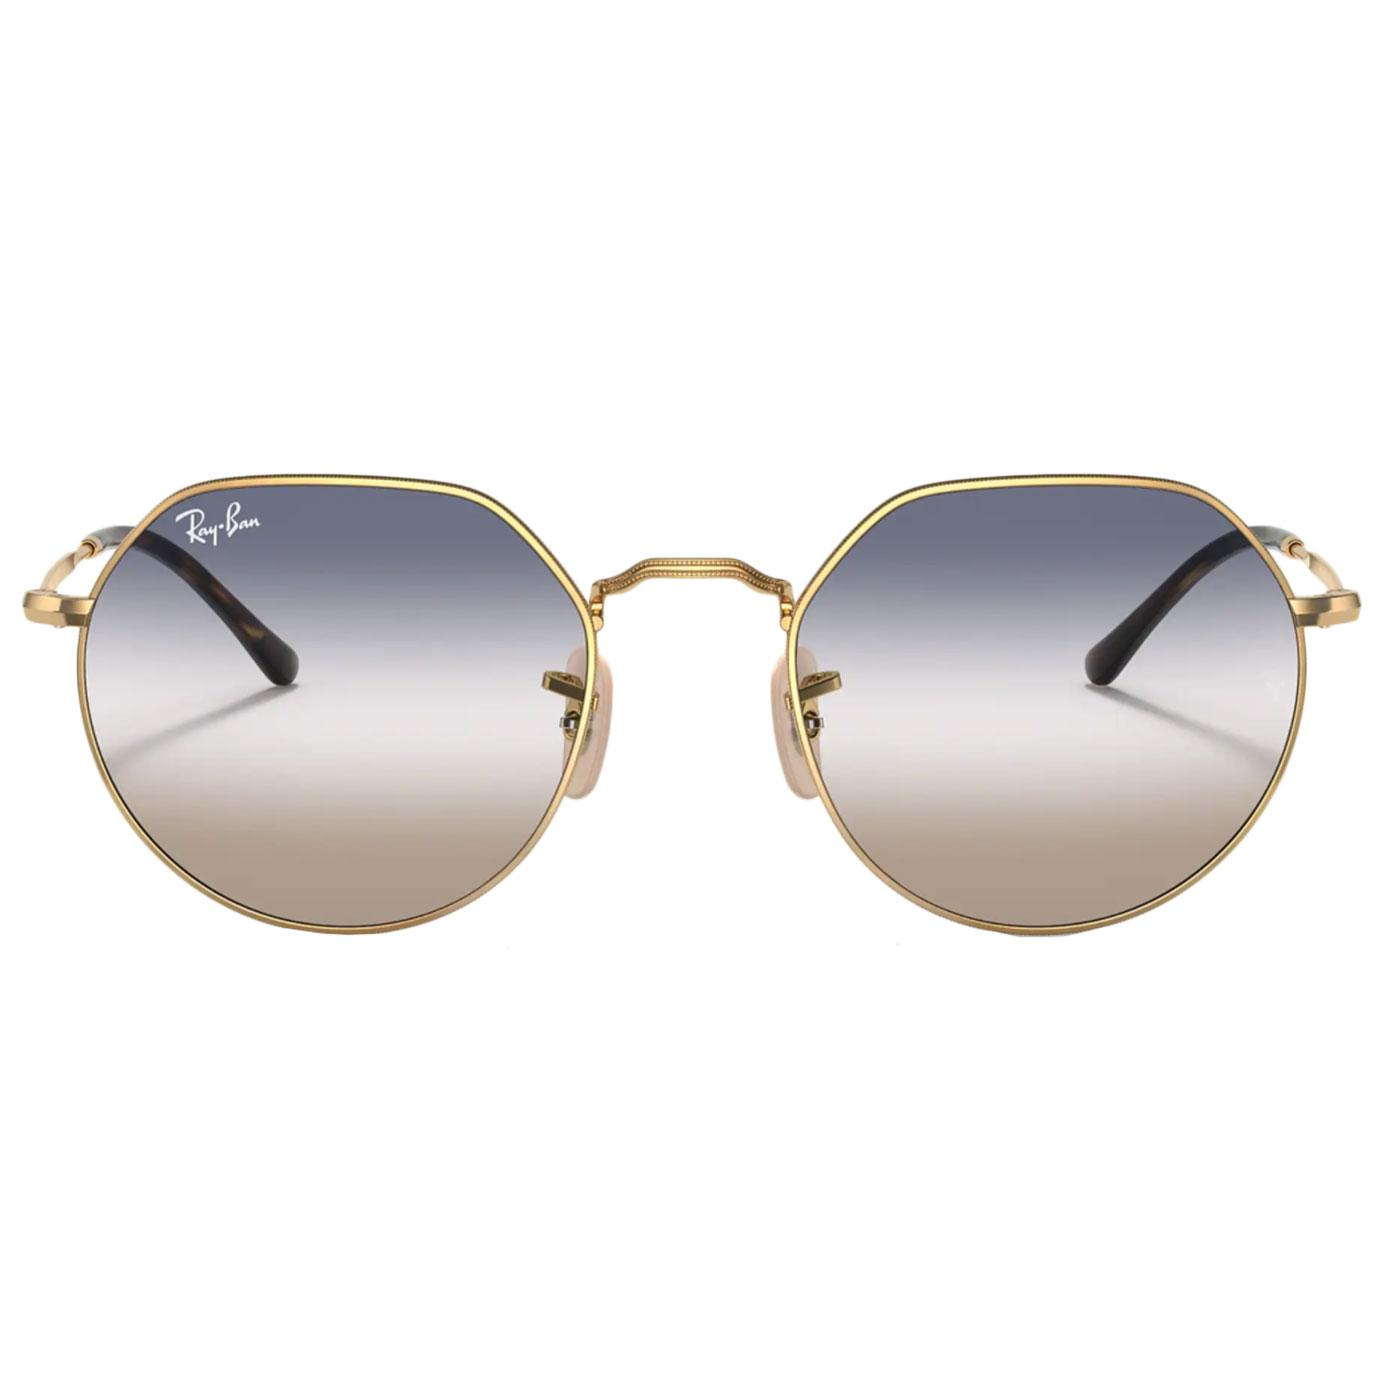 Jack RAY-BAN Retro 60s/70s Hexagonal Sunglasses AG